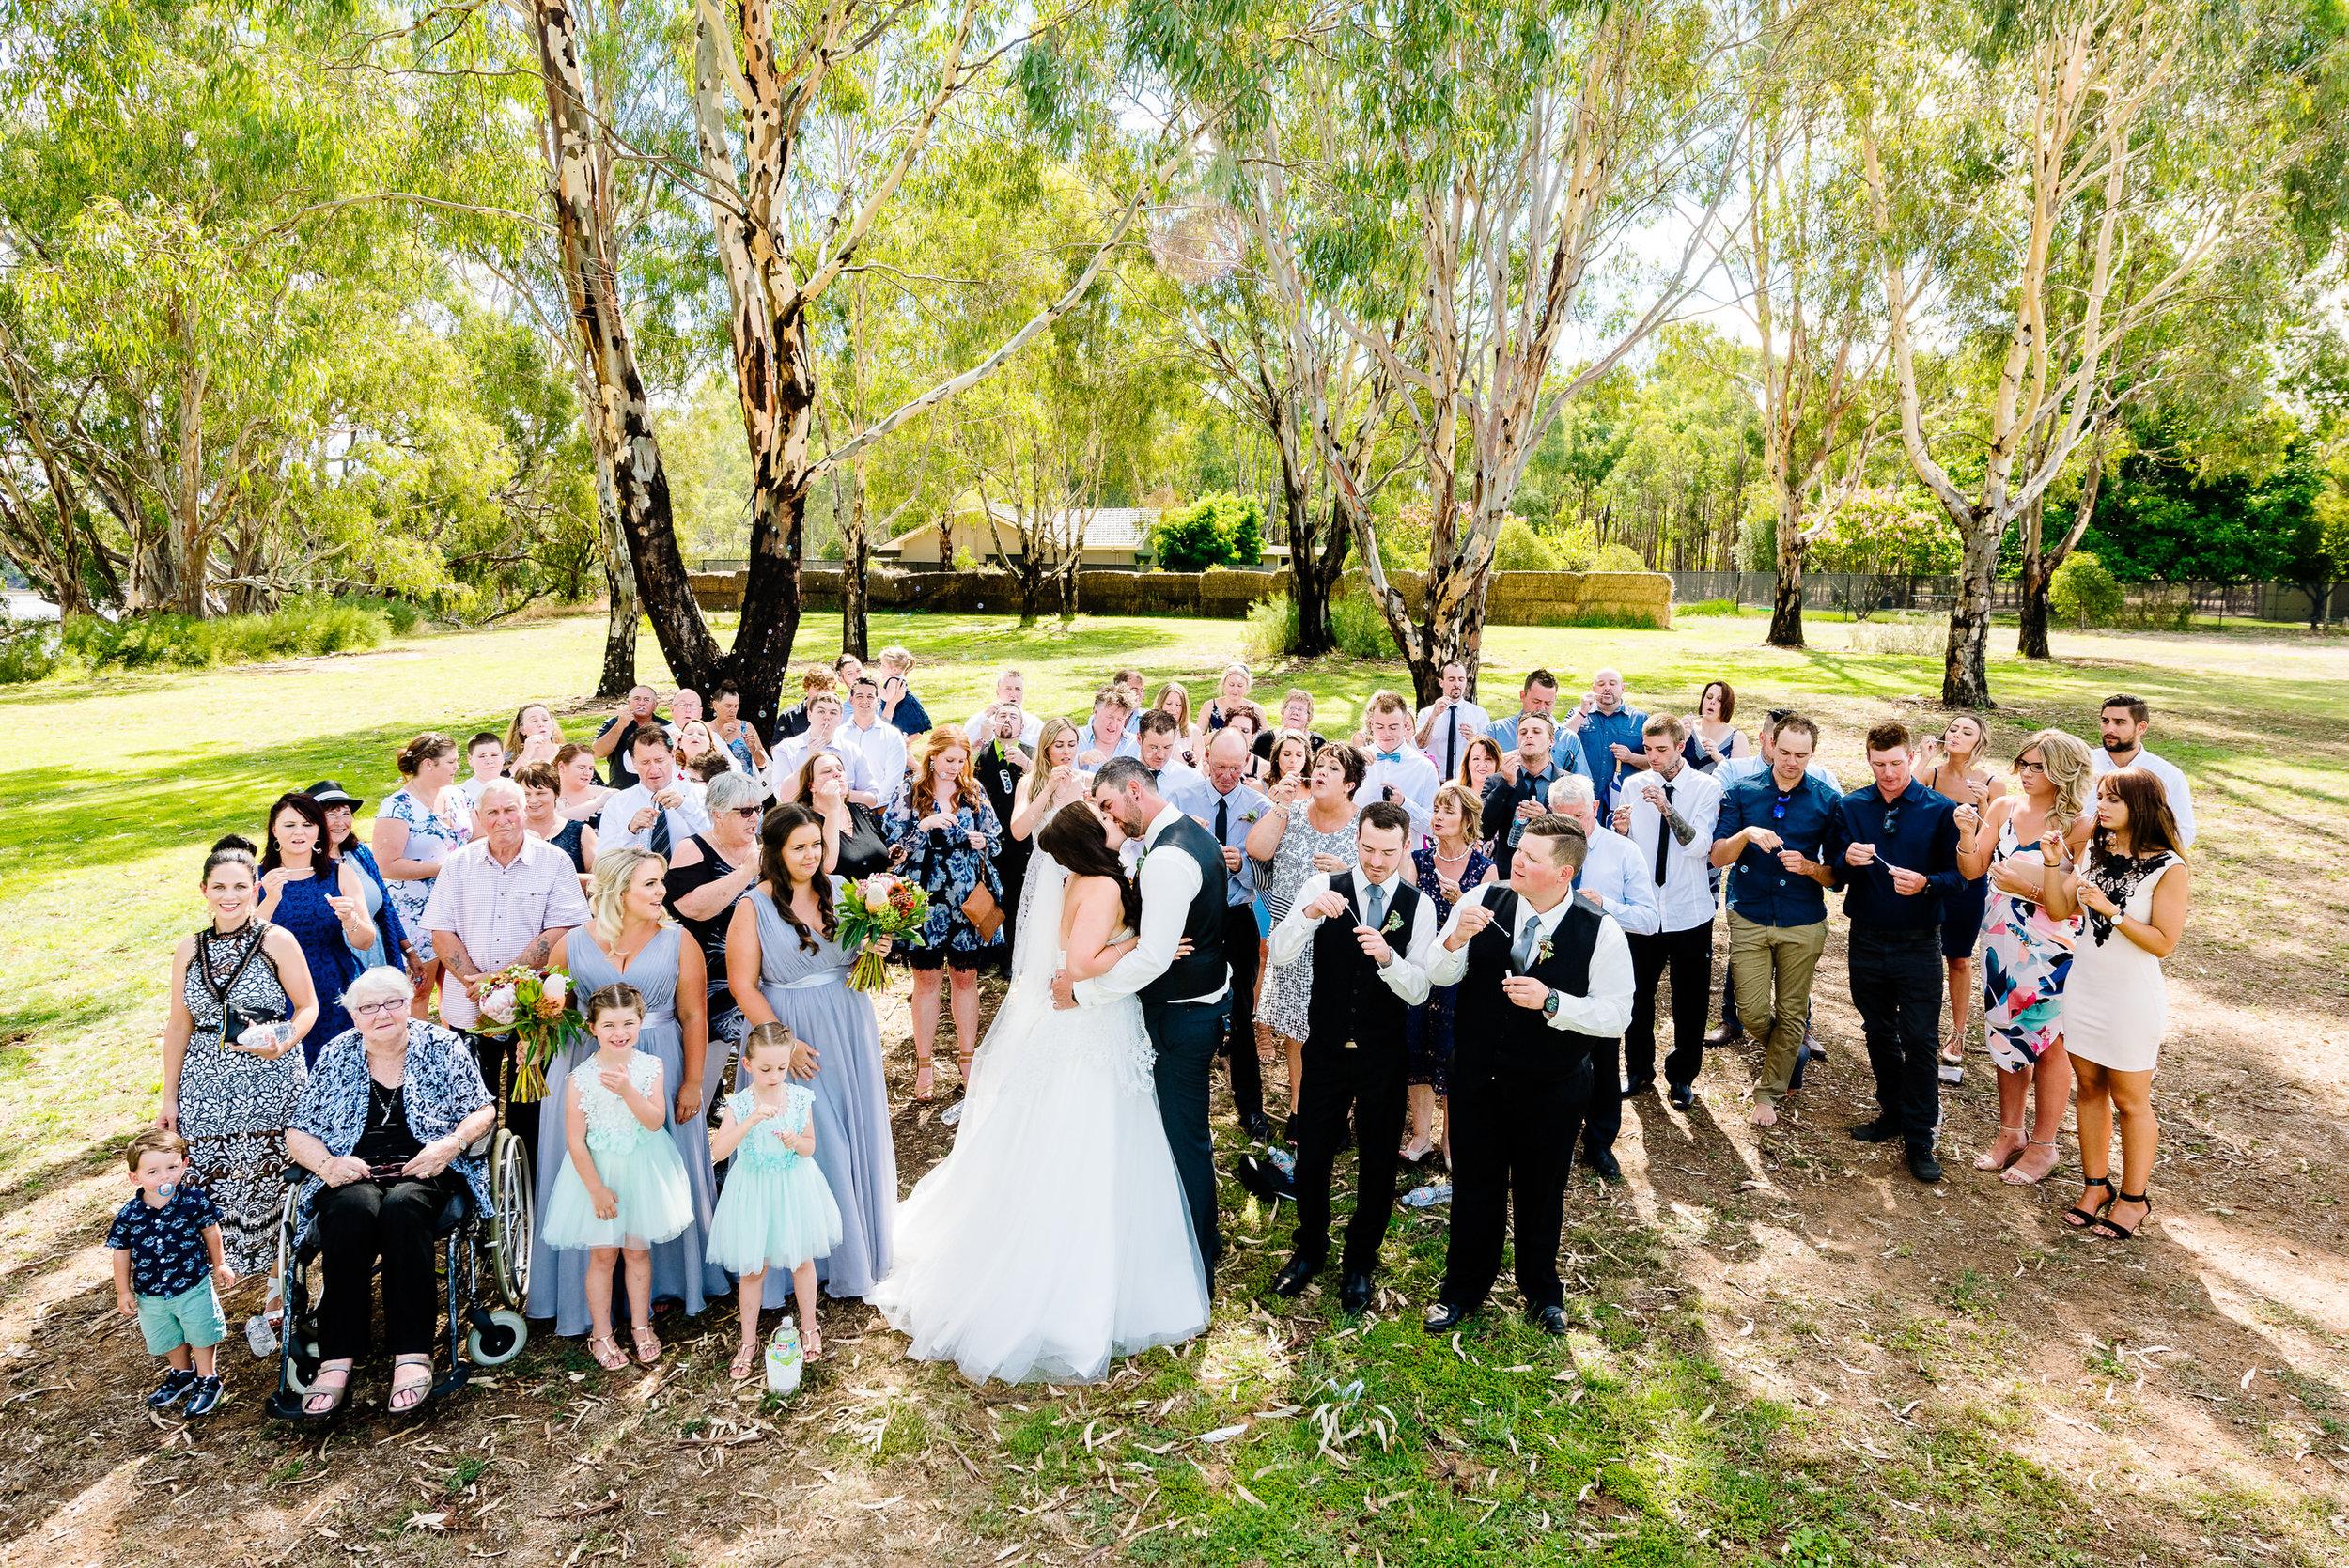 Justin_Jim_Echuca_Wedding_Photography_Tindarra-186.JPG